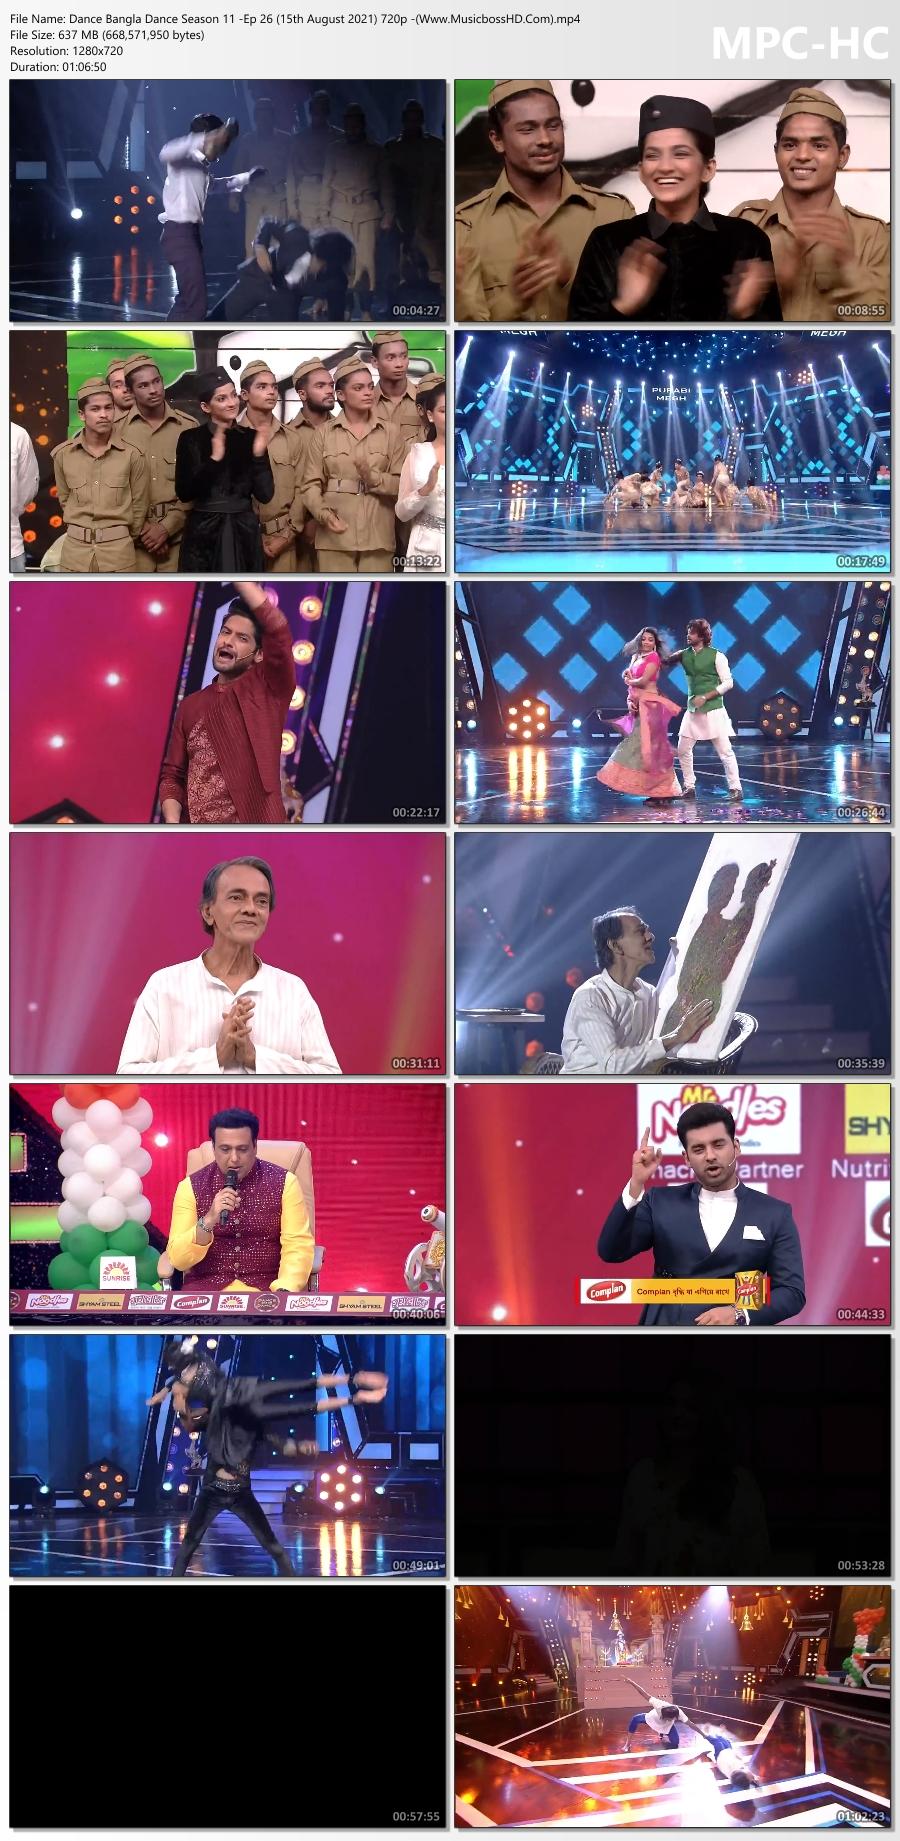 Dance-Bangla-Dance-Season-11-Ep-26-15th-August-2021-720p-Www-Musicboss-HD-Com-mp4-thumbs